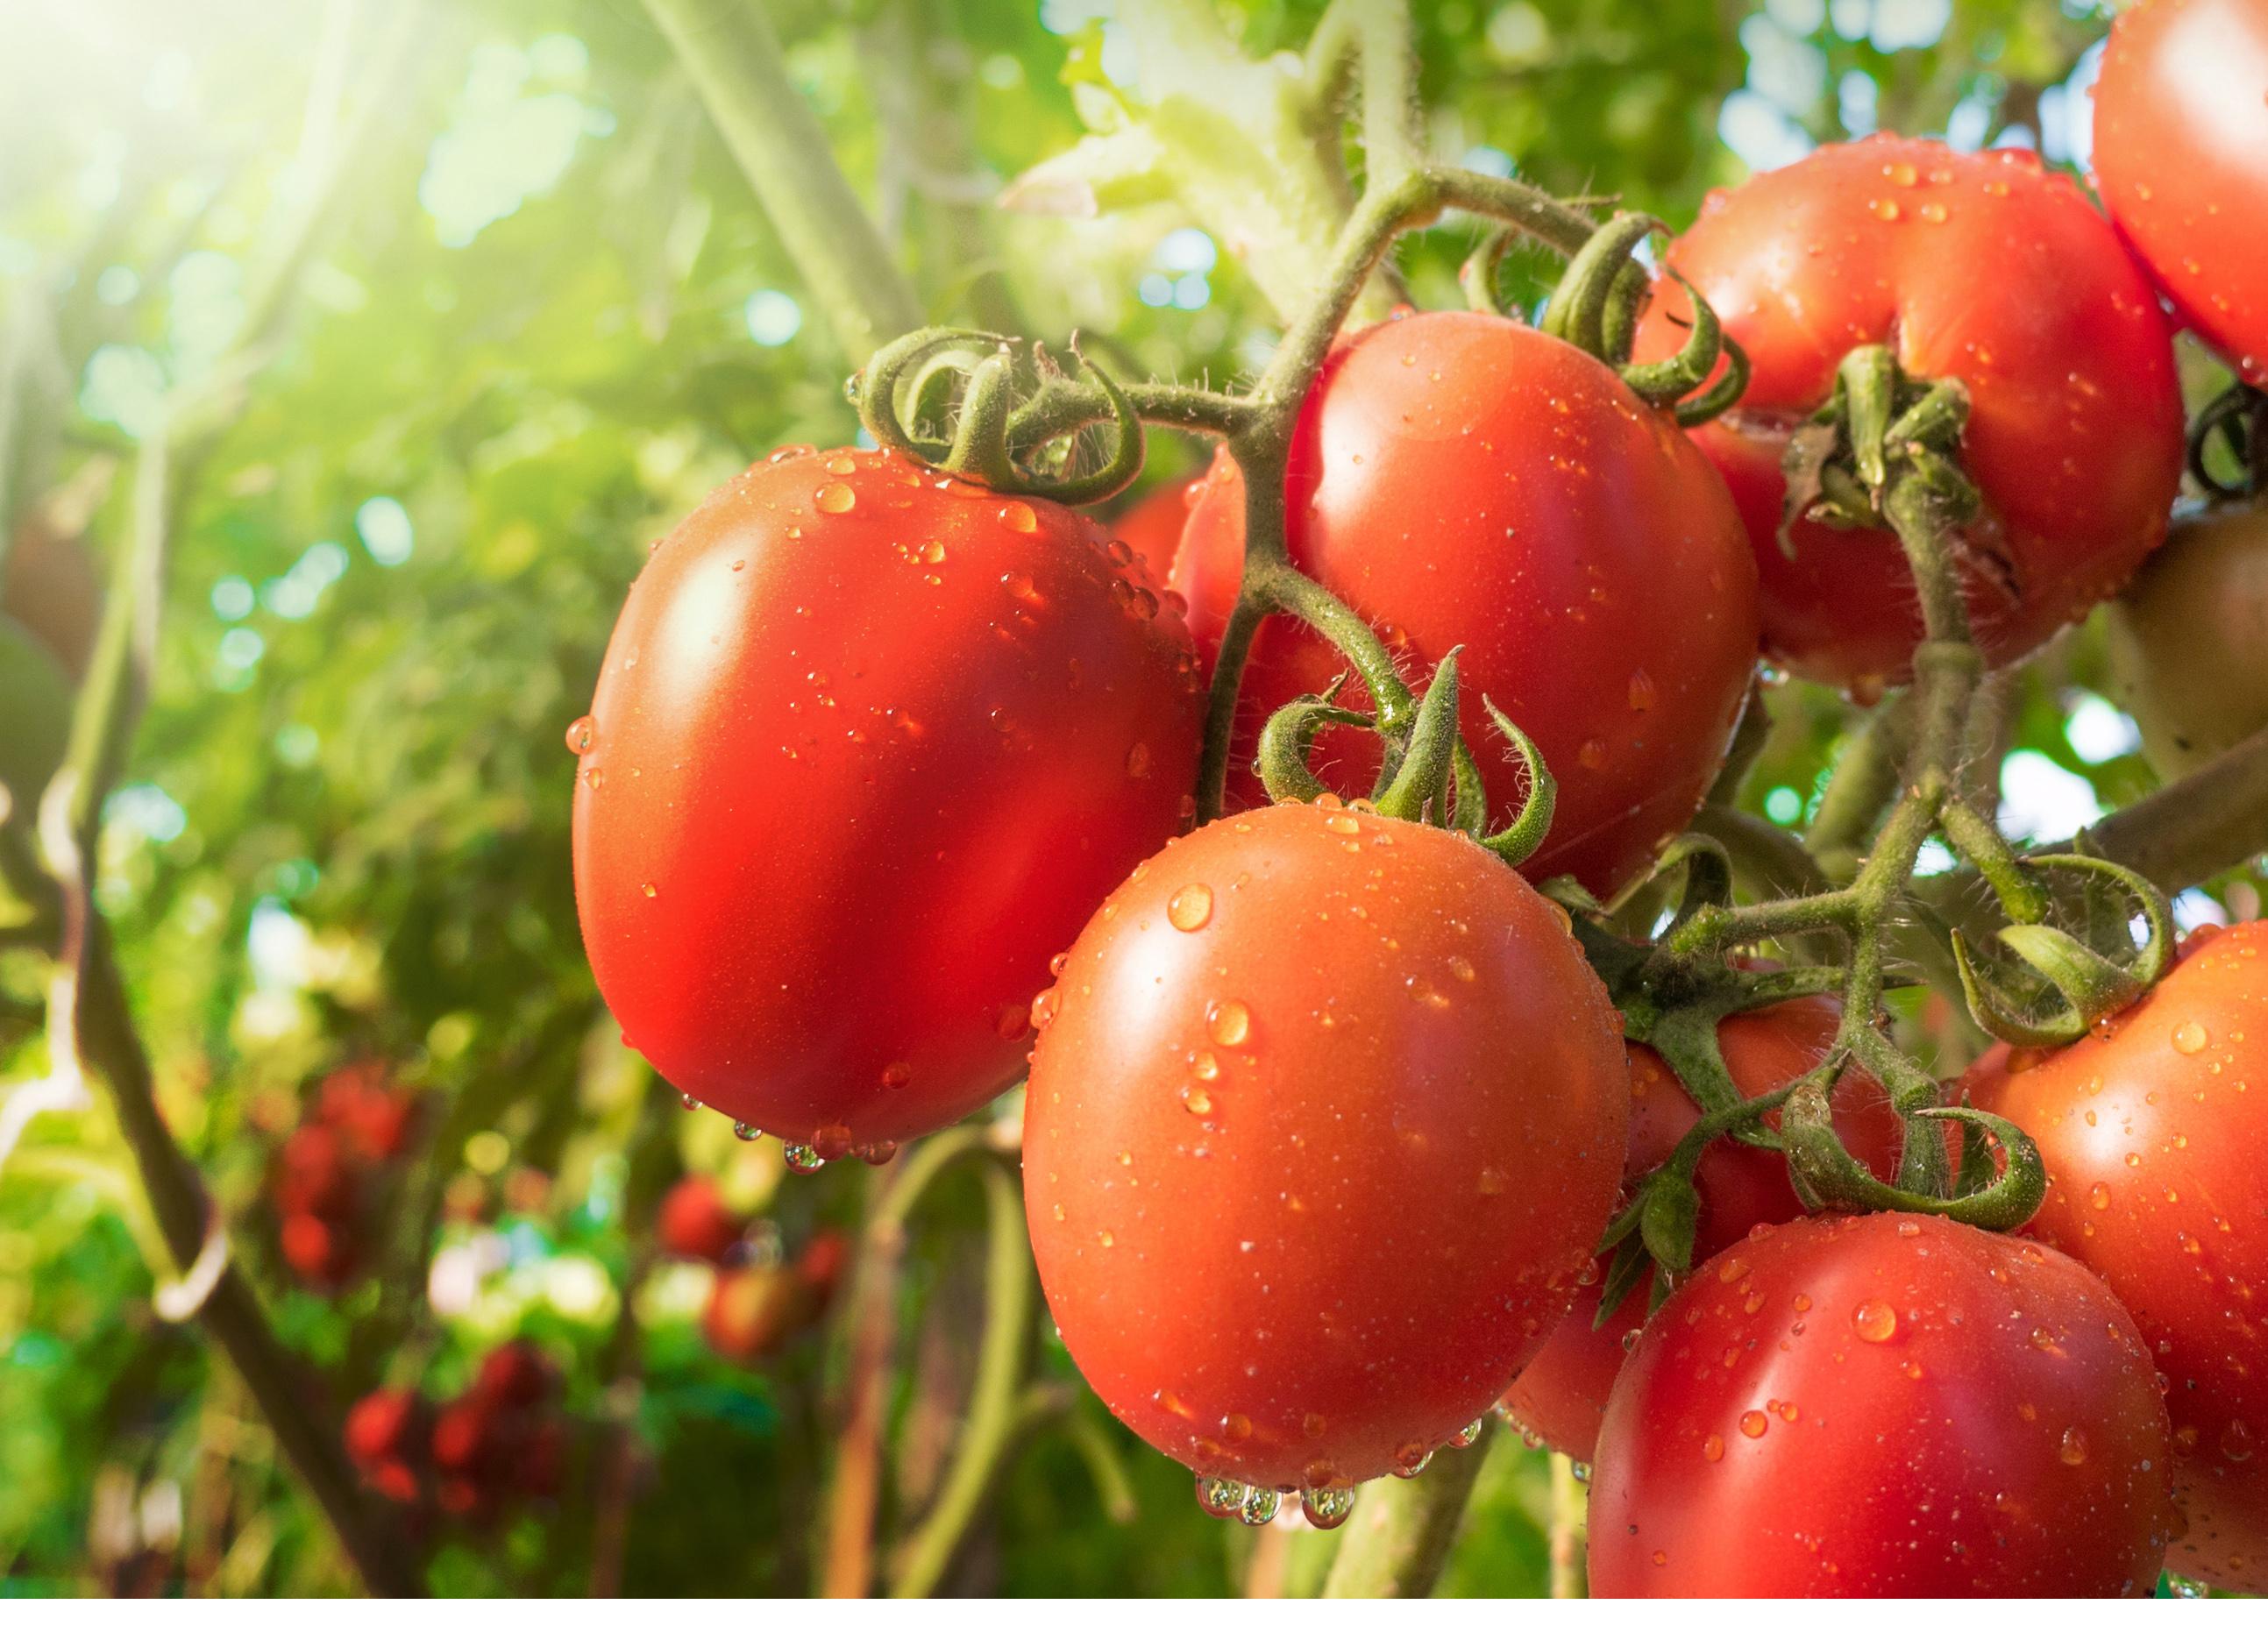 https://gelato-naturale.com/wp-content/uploads/2019/01/tomato9-2587x1871.jpg